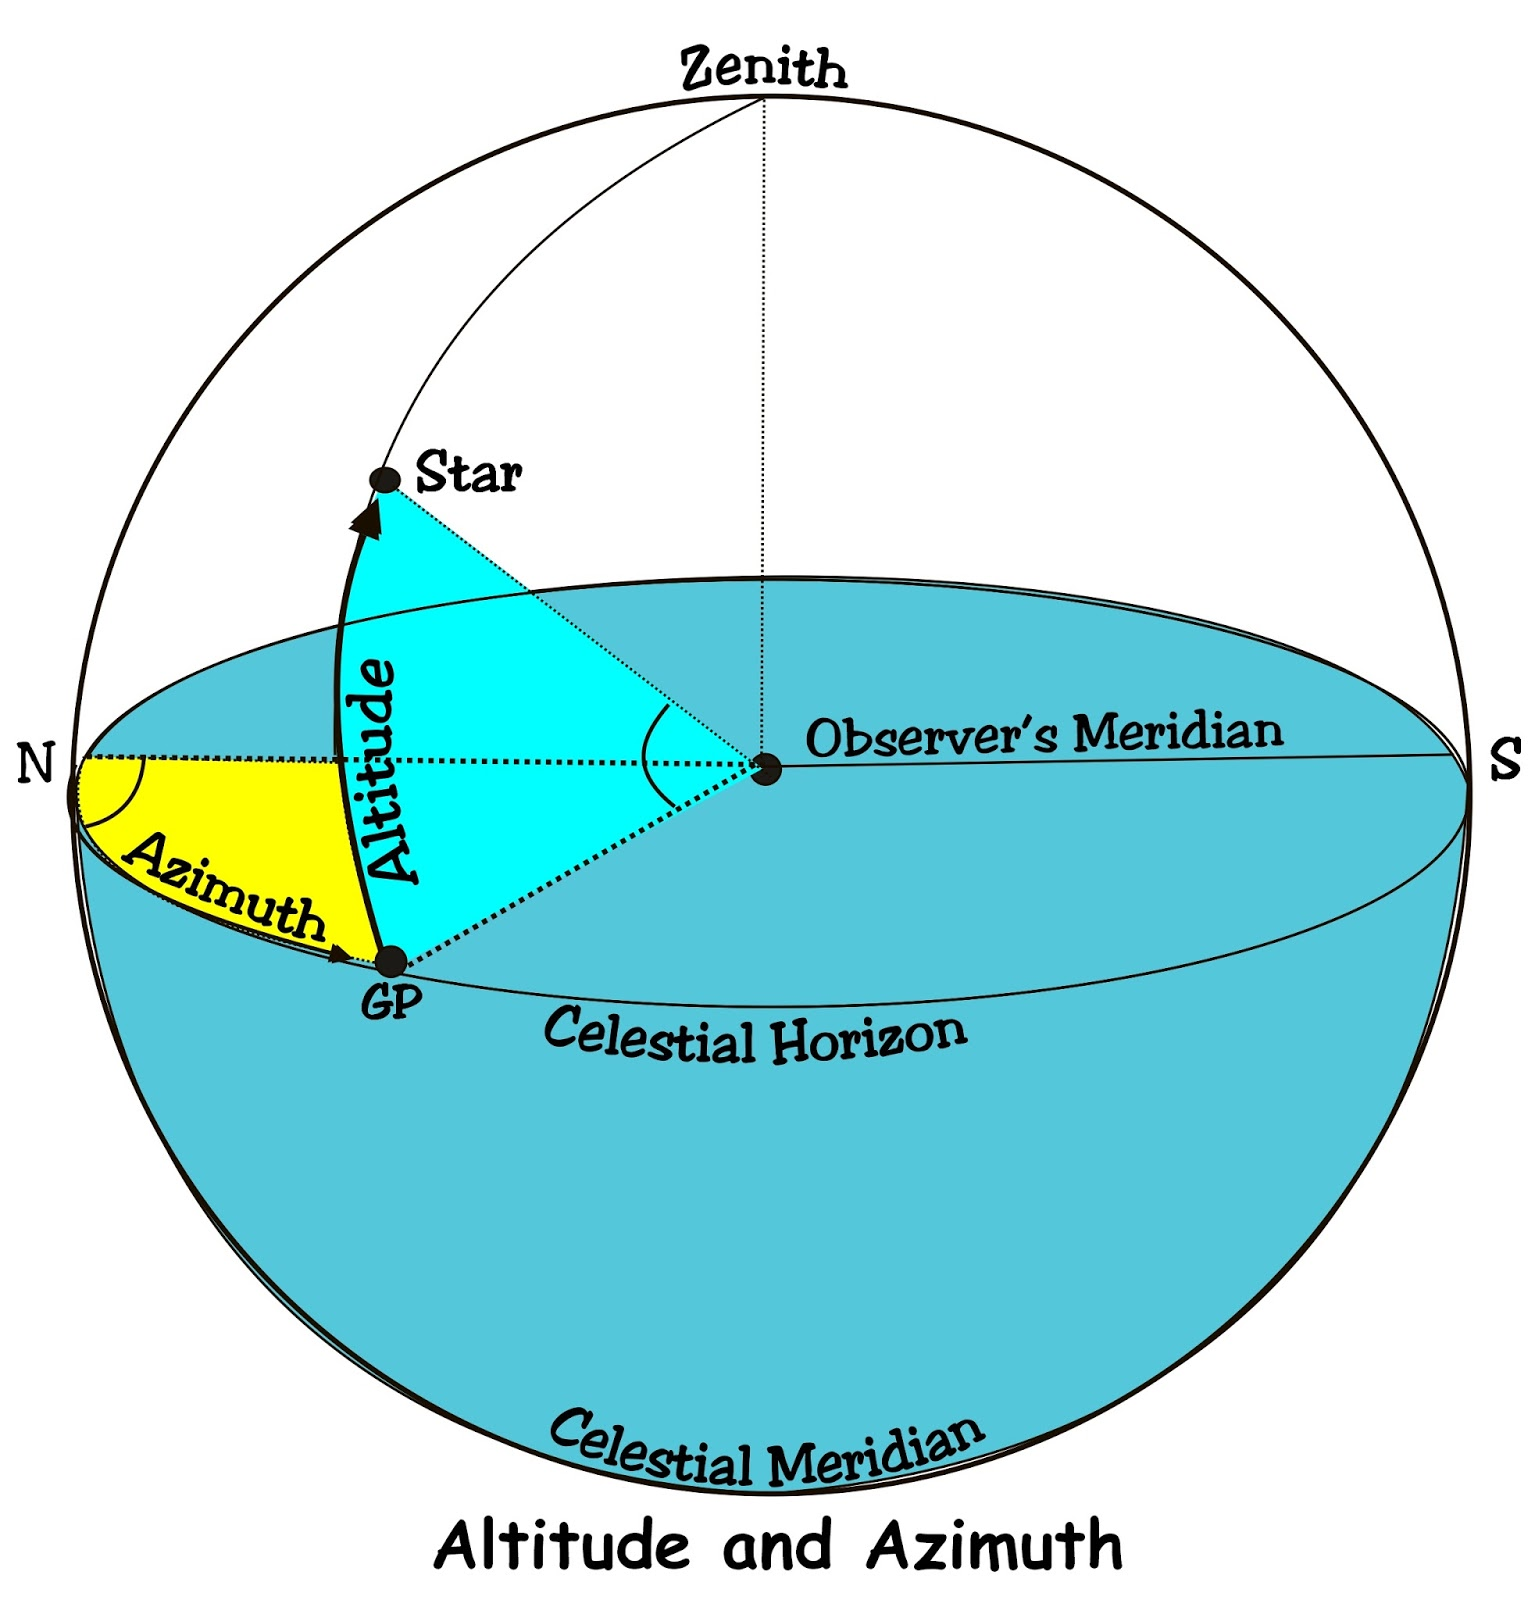 Sun Diagram Elevation Coleman Furnace Wiring Gas Antipodean Mariner